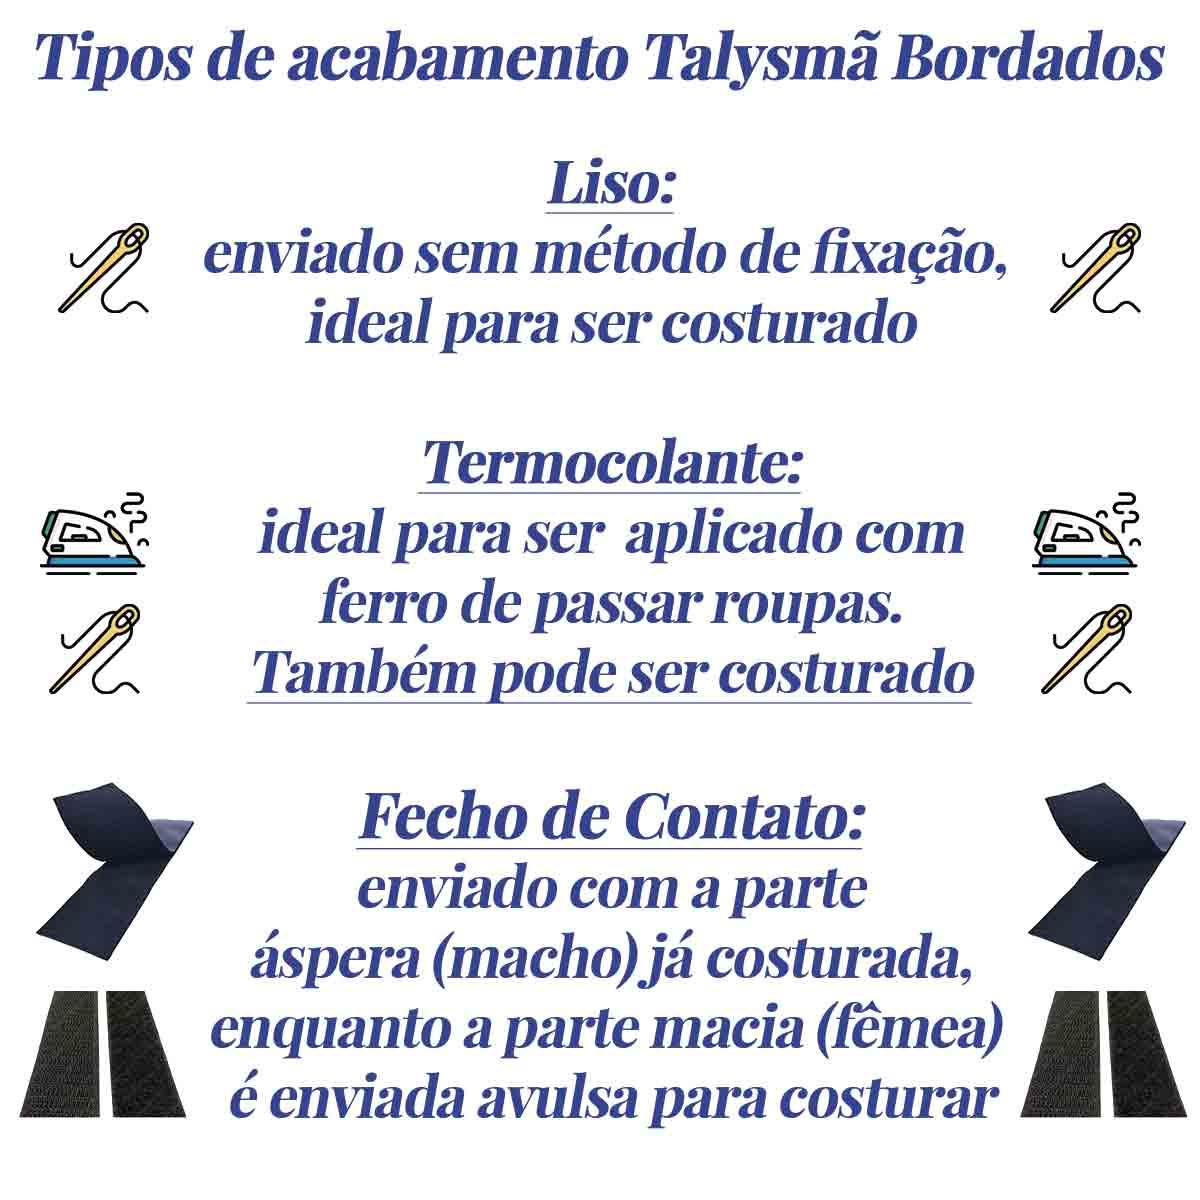 Patch Bordado - Bandeira Brasil Tan Coyote Desert BD50321-264  - Talysmã Bordados